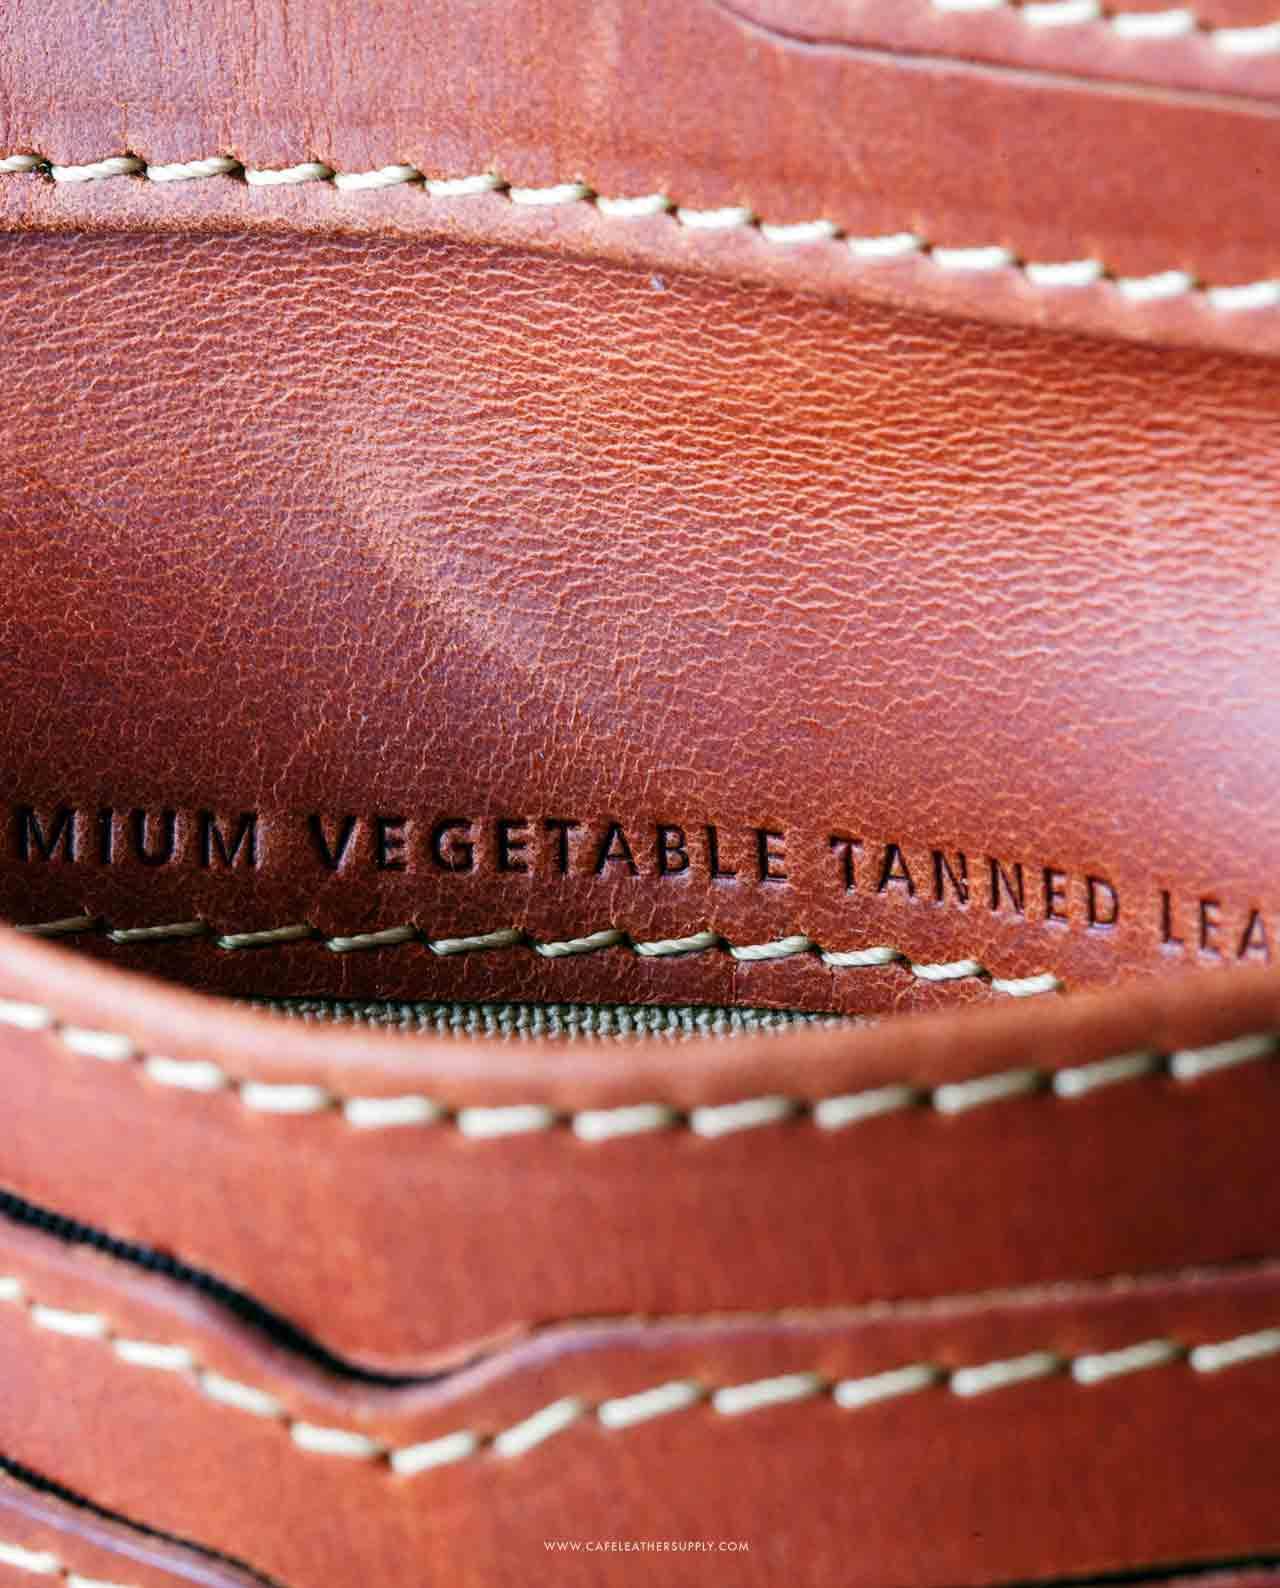 Bolsillo de la cartera de piel costa rica roasted. Leather pouch.